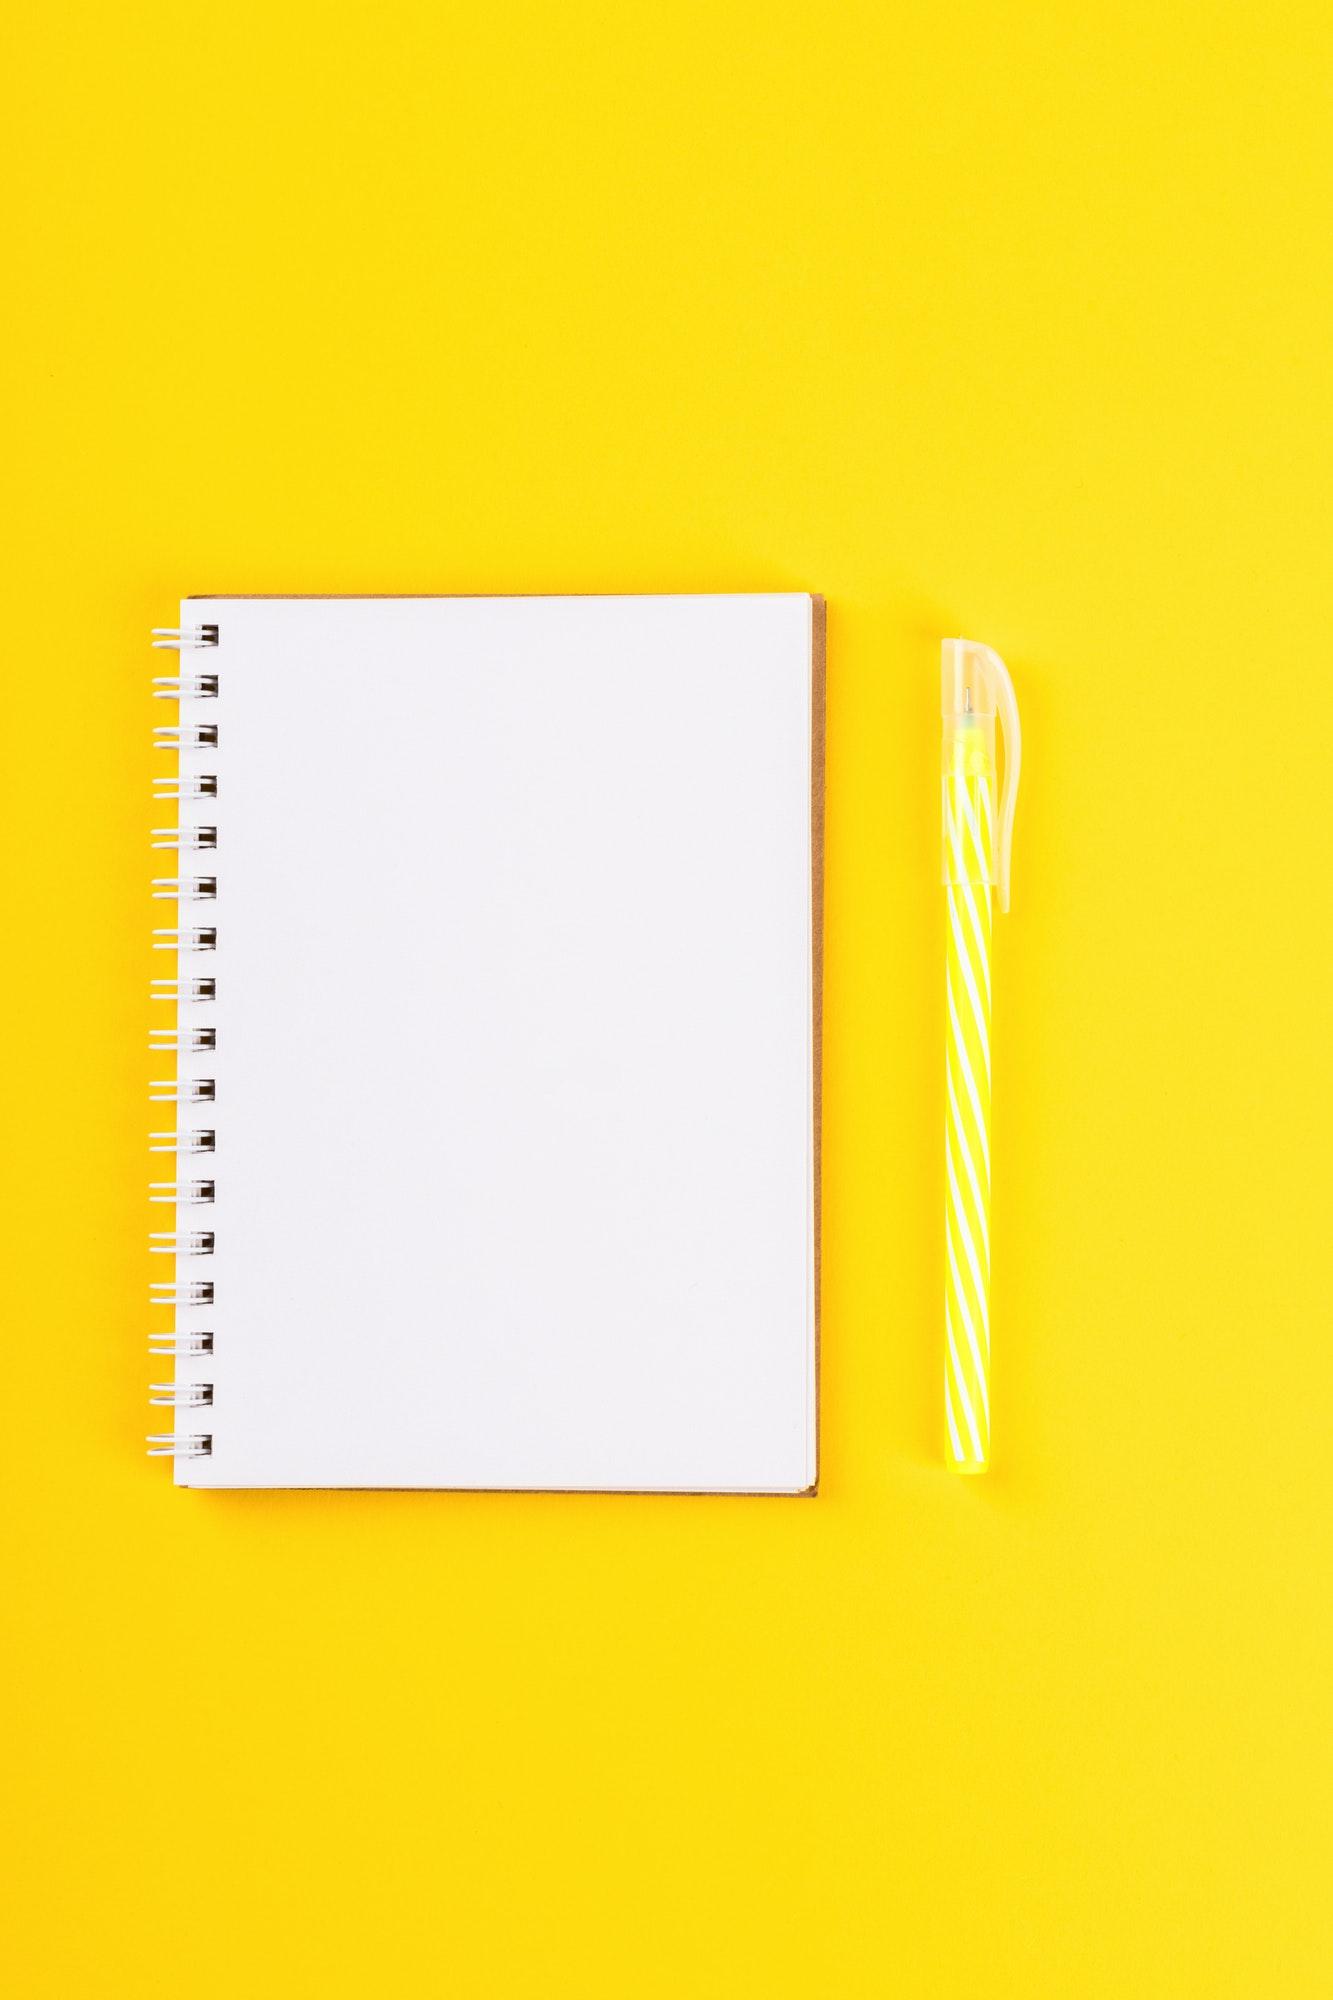 Notebook, pen Accessories office concept